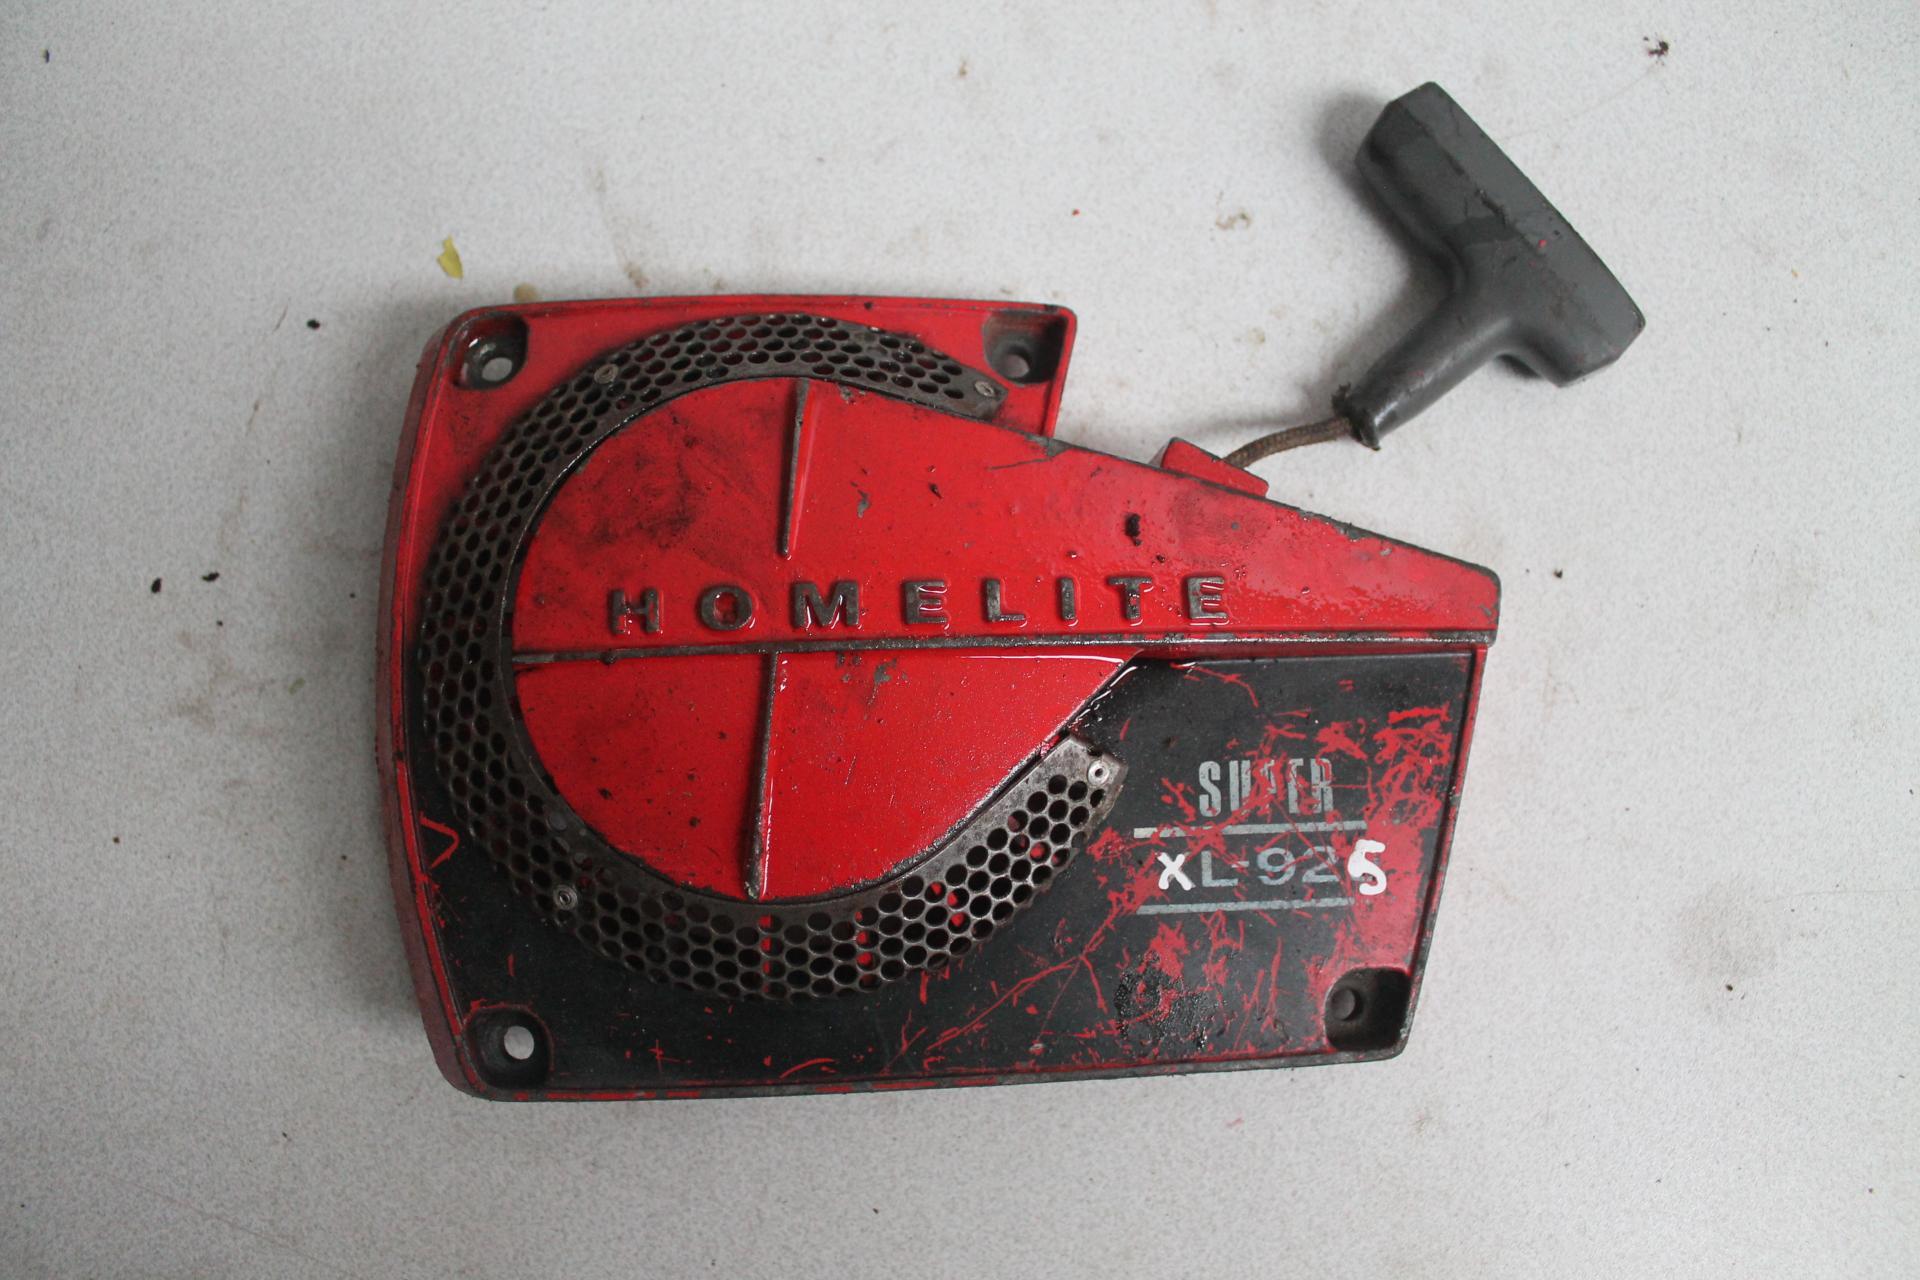 Arranque Homelite XL 925